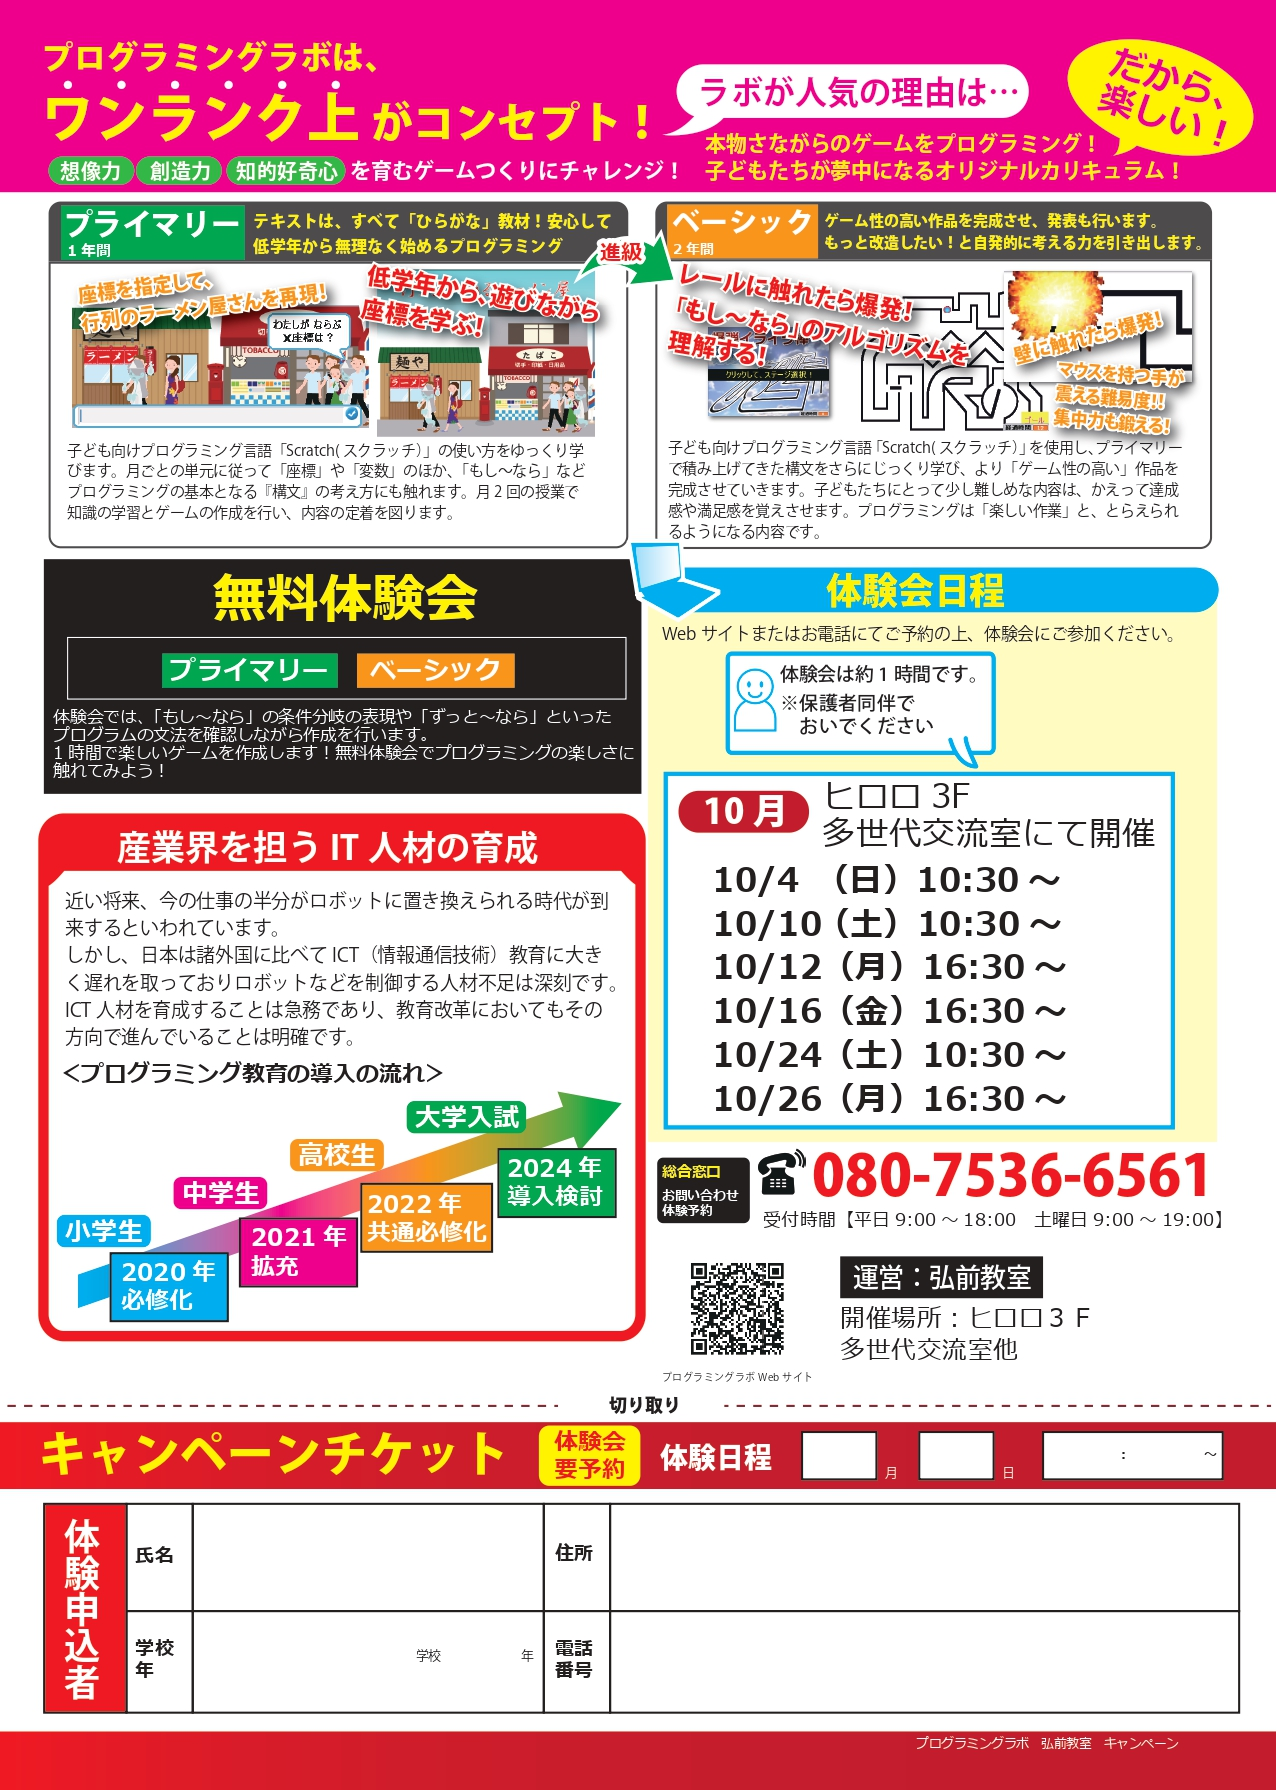 弘前教室_page-0002[1].jpg